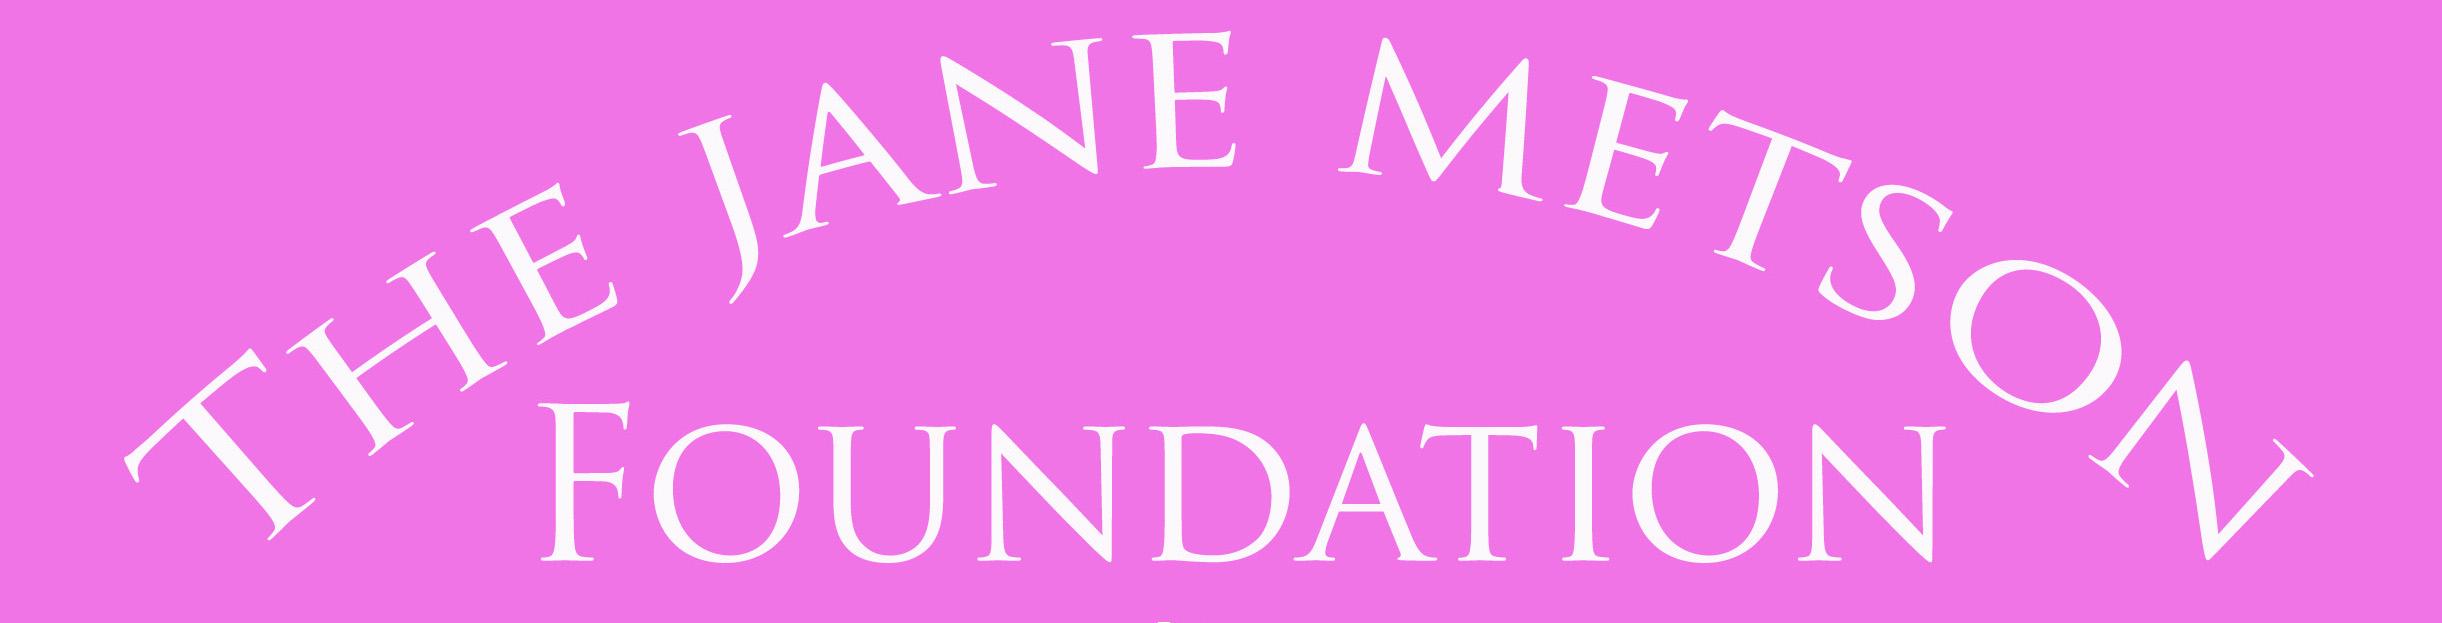 The Jane Metson Foundation